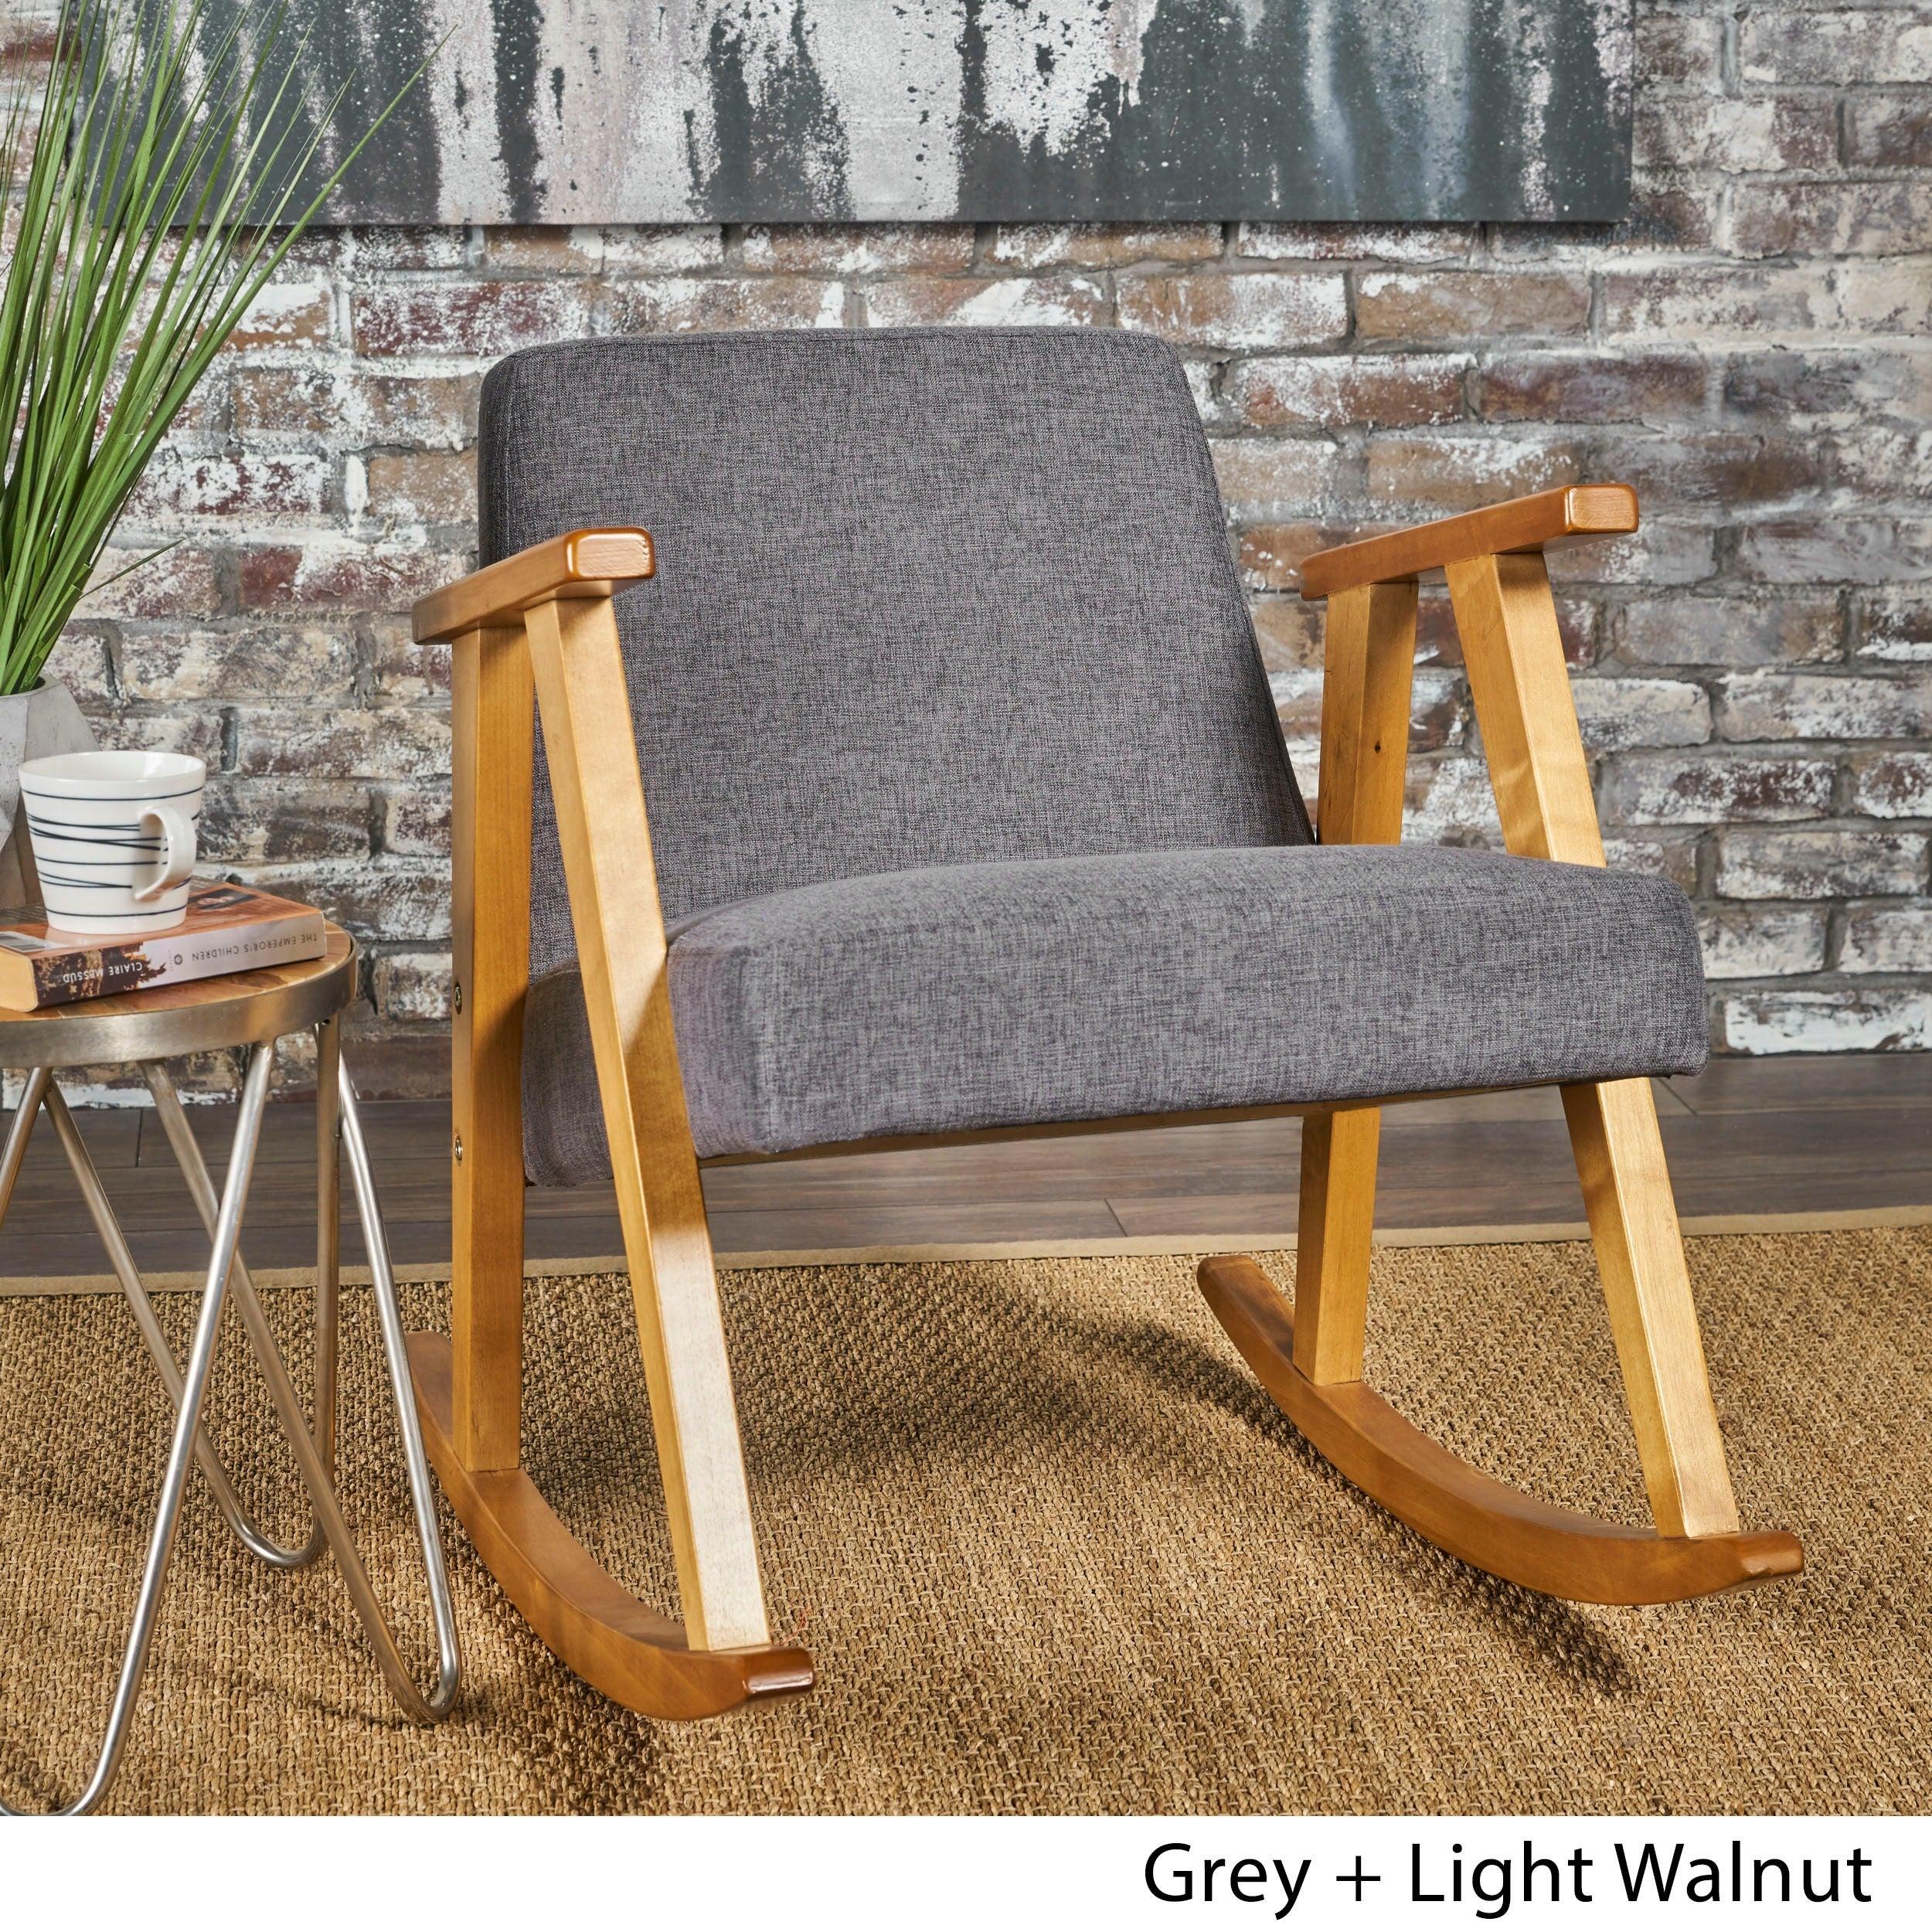 Popular Photo of Mid Century Modern Fabric Rocking Chairs